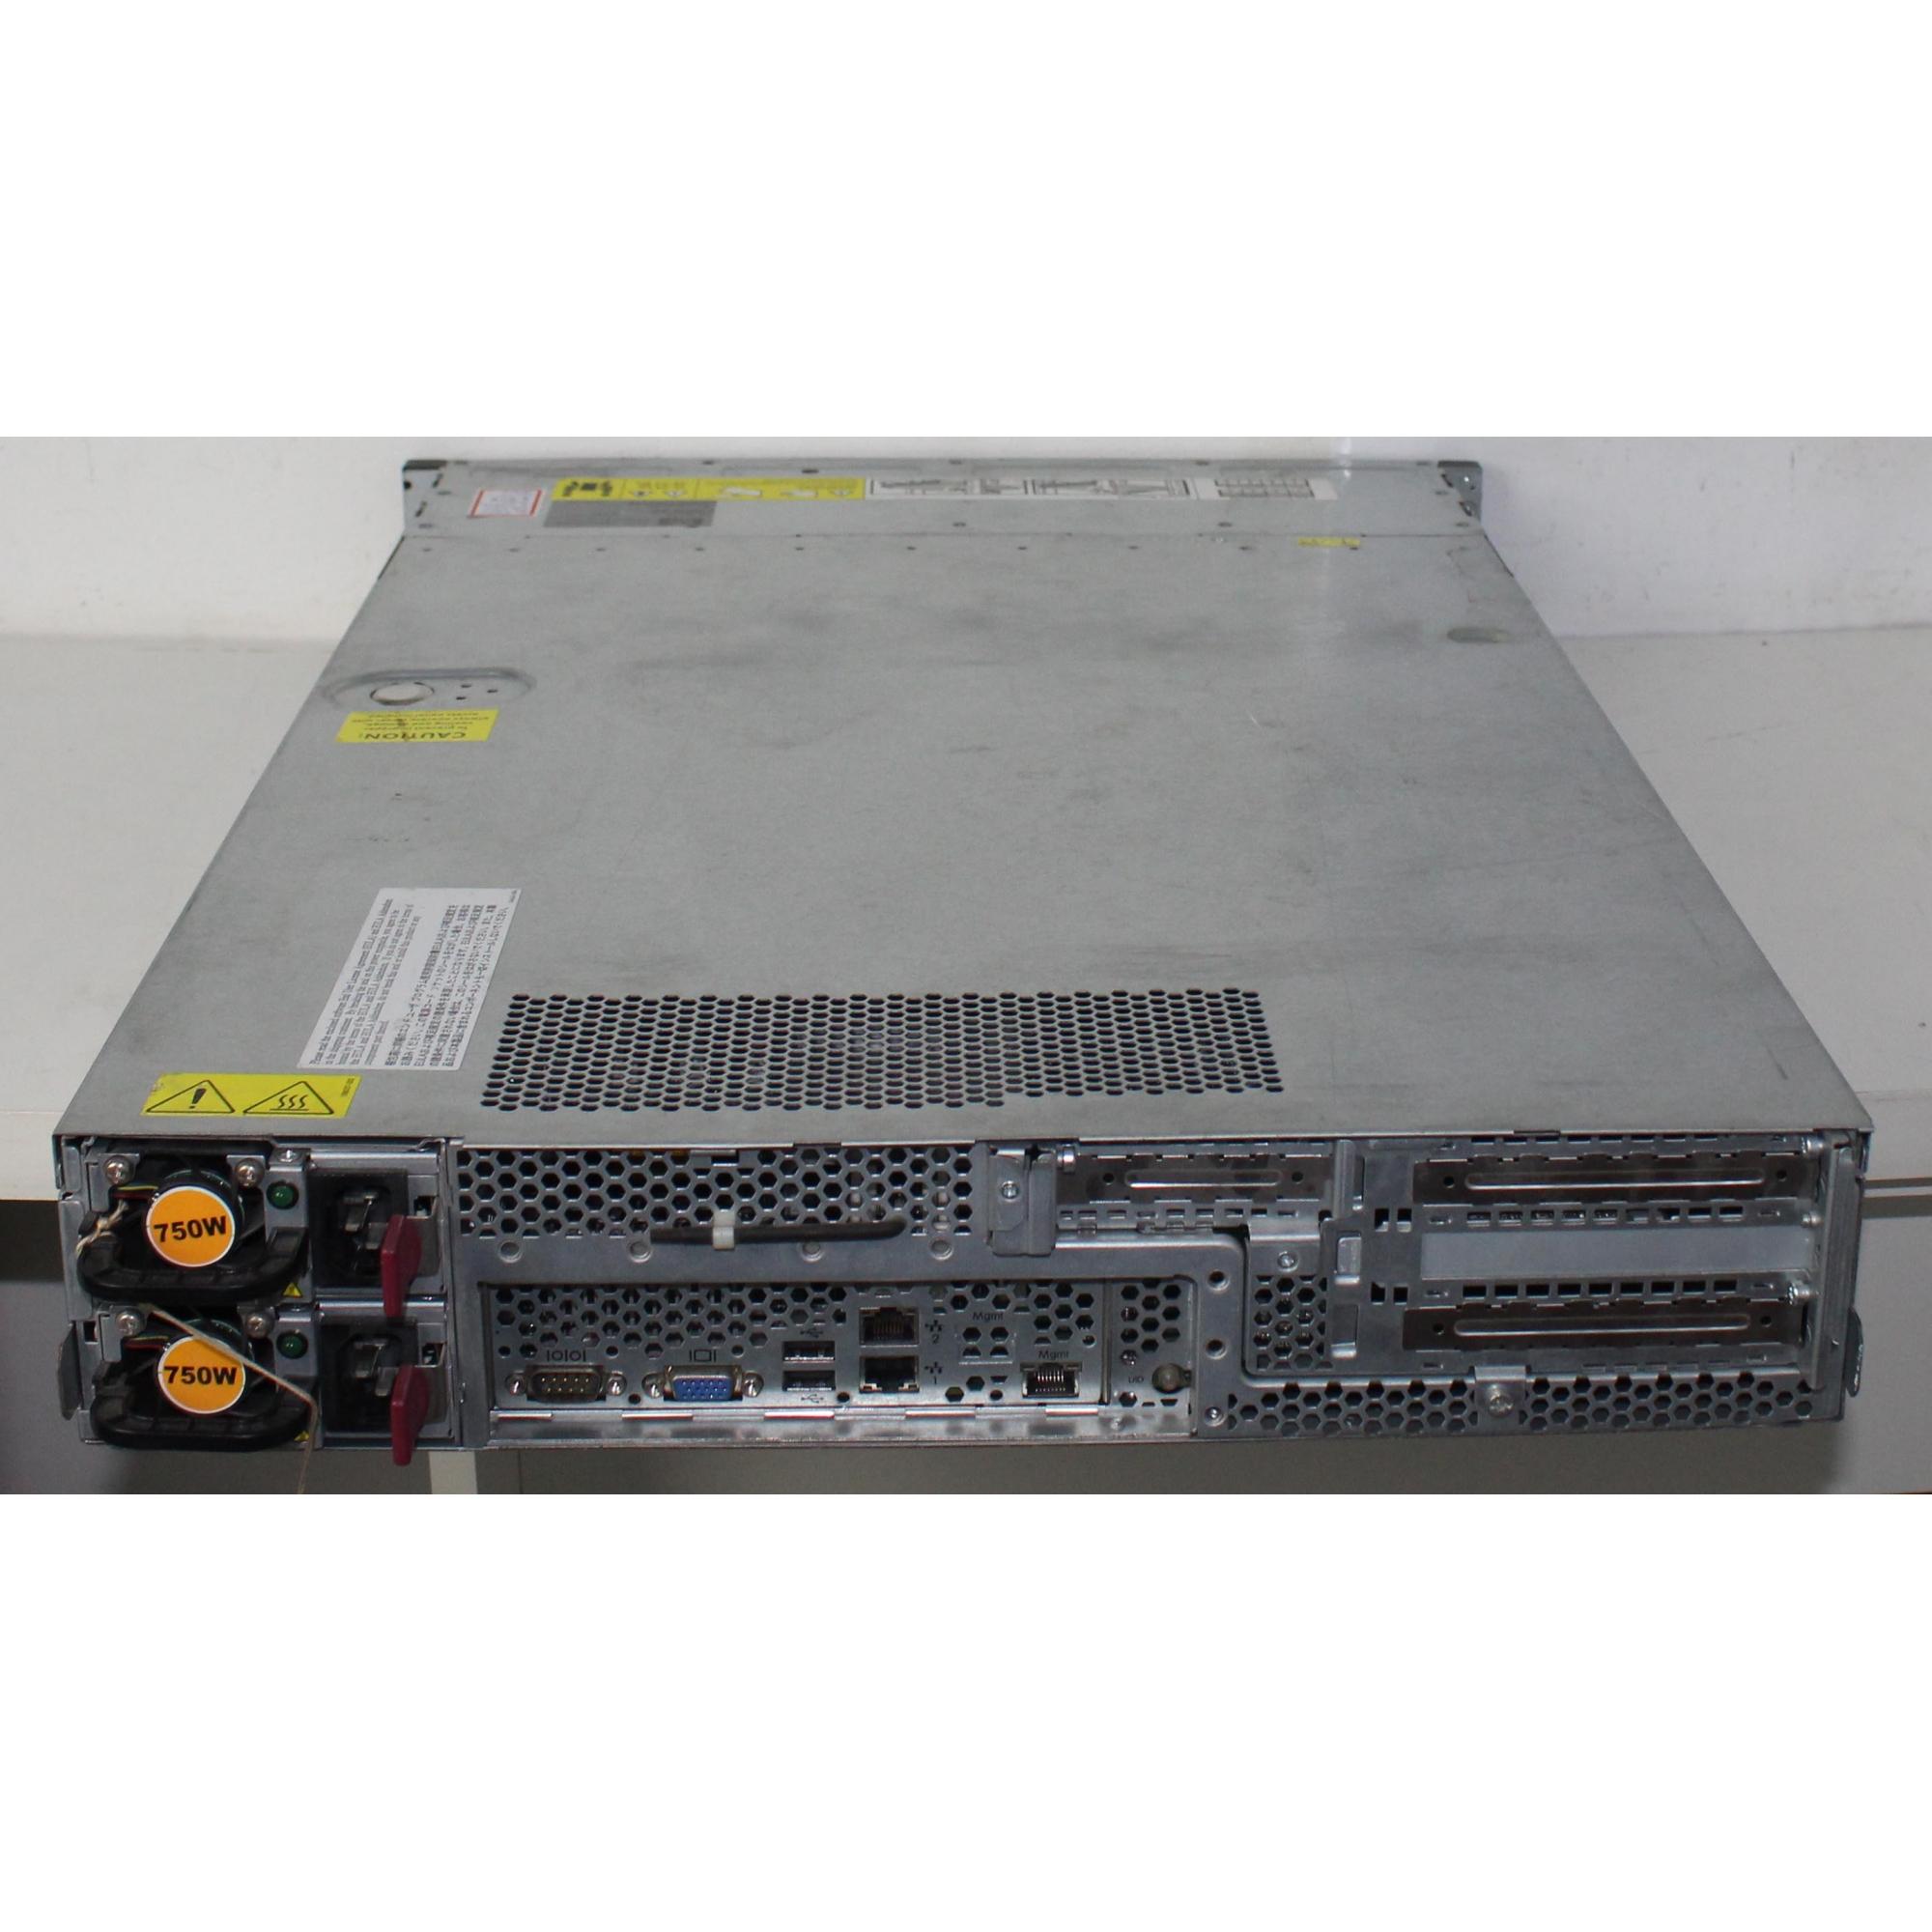 Storage HP P4300 G2 Intel Xeon E5220 2.27GHz 14GB HD-3.5TB (Não Enviamos)